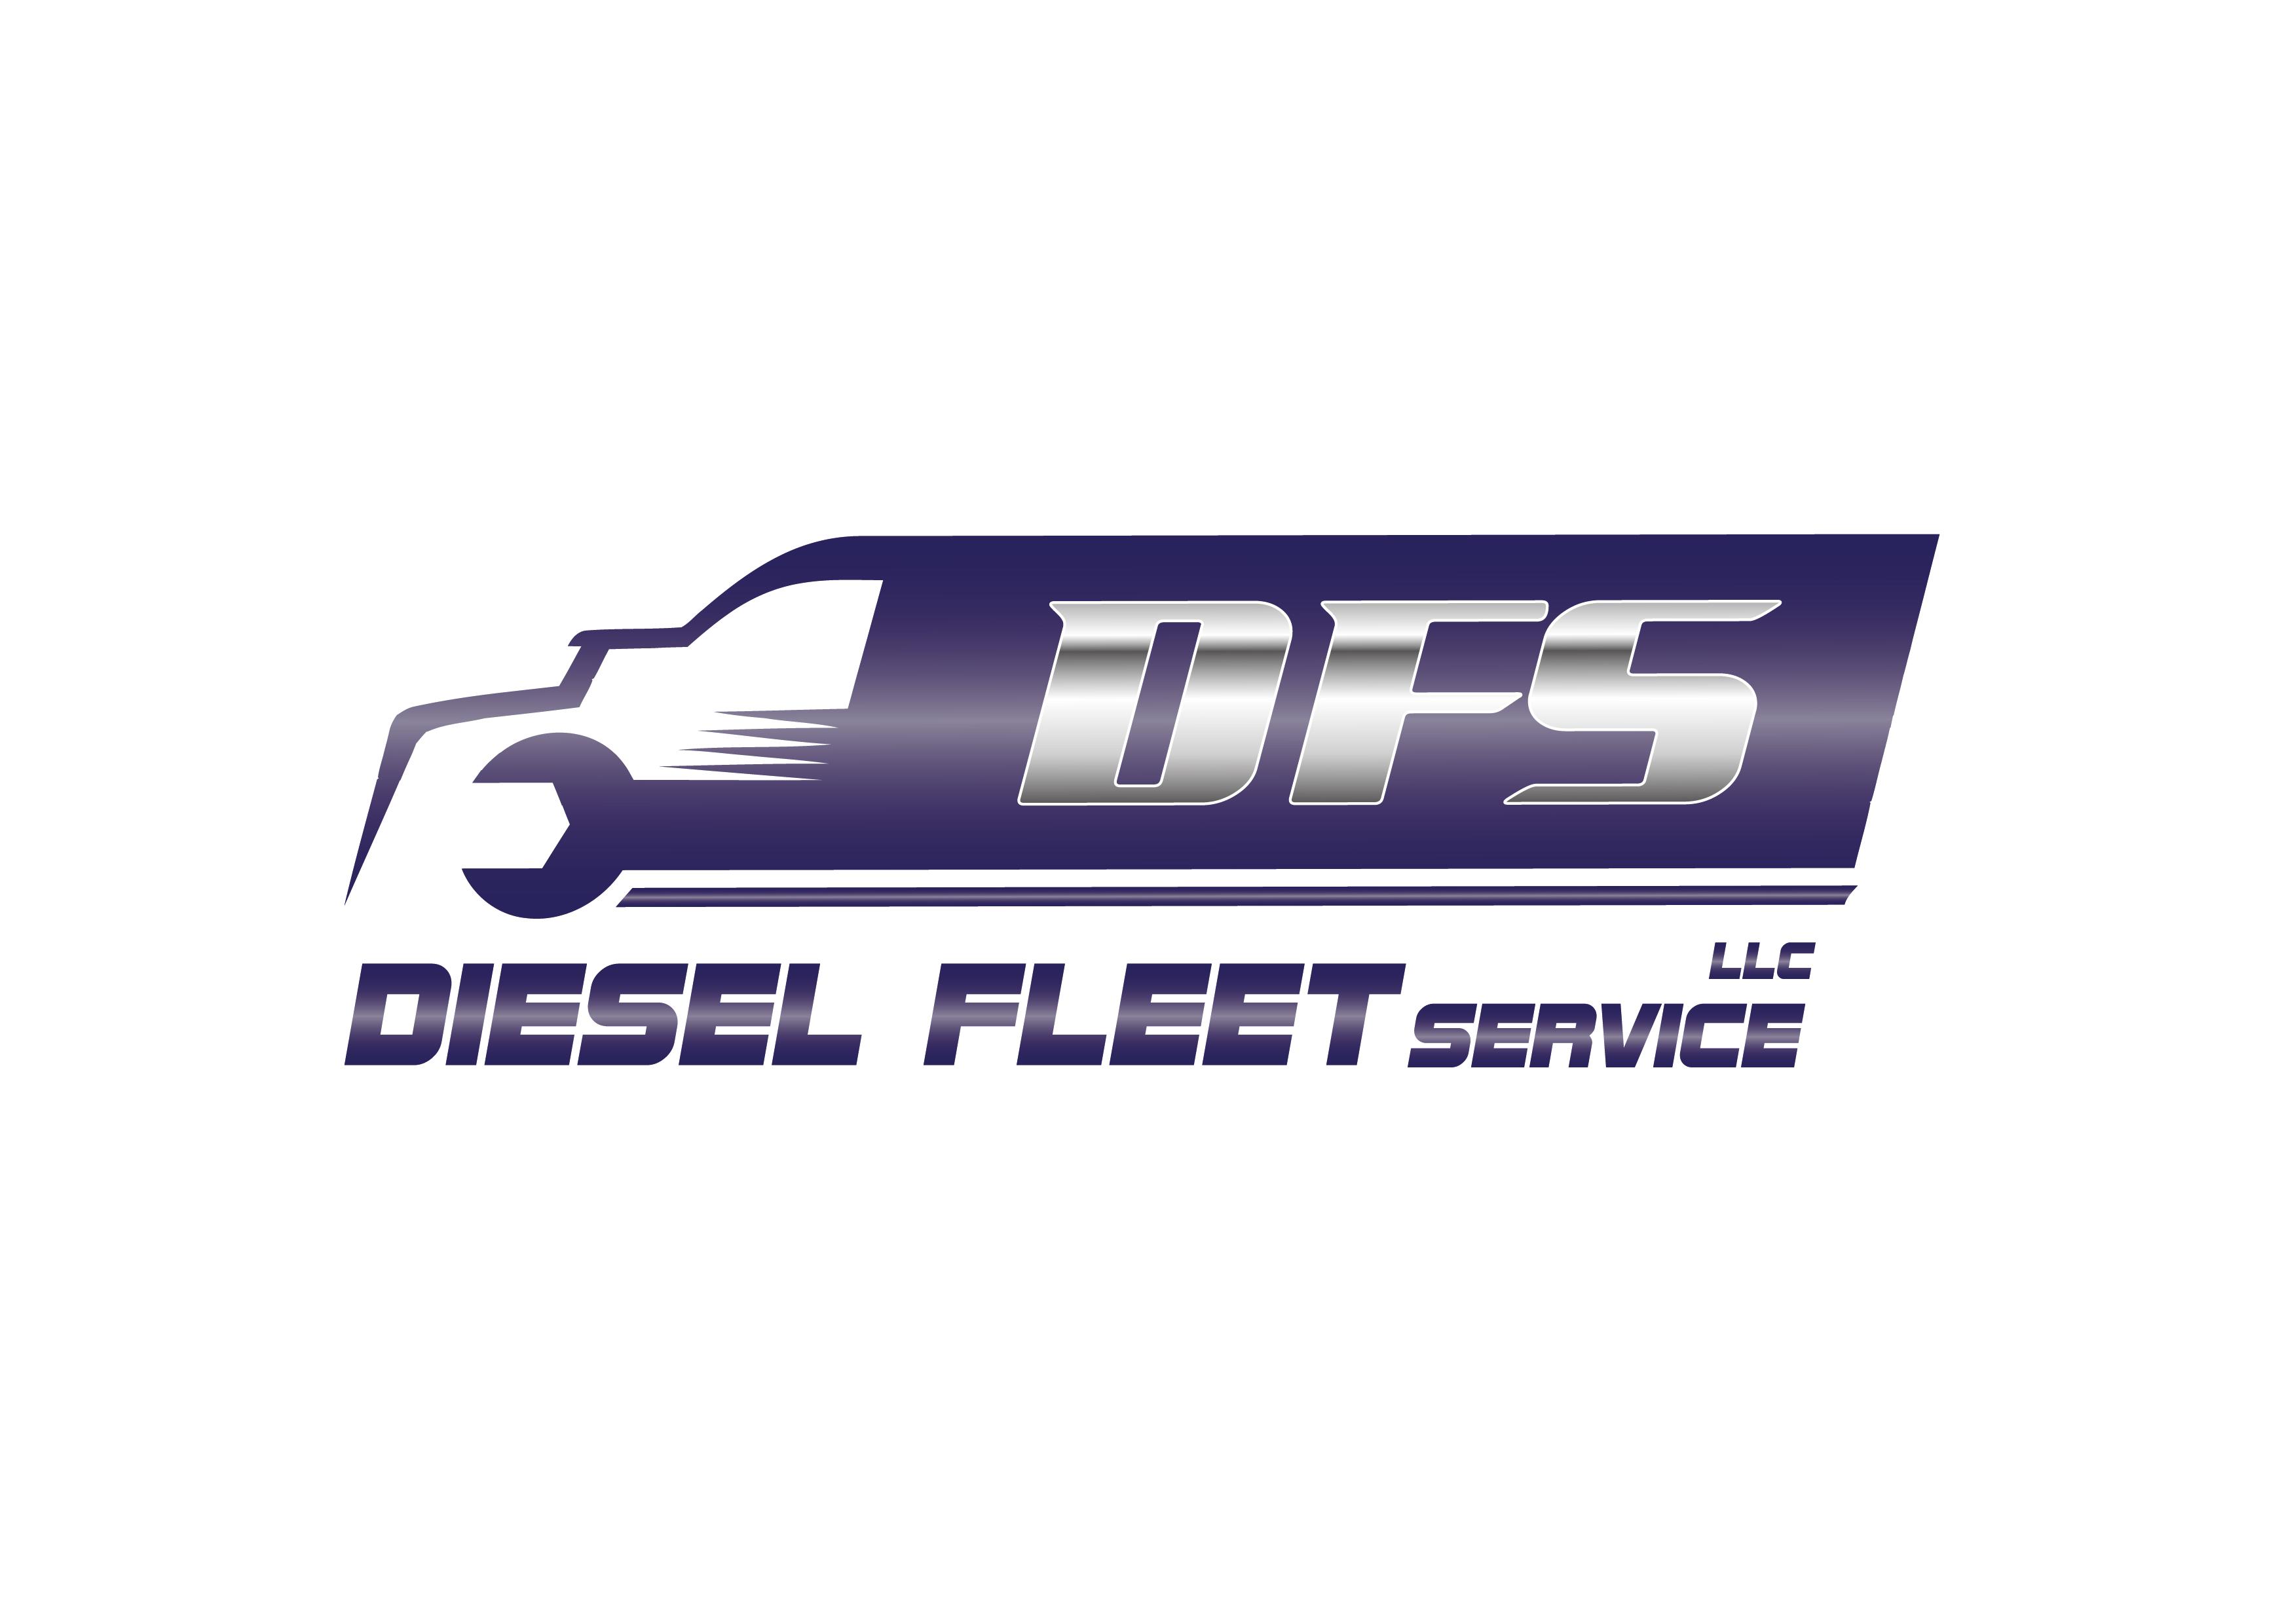 Logo Design by VENTSISLAV KOVACHEV - Entry No. 37 in the Logo Design Contest Artistic Logo Design for Diesel Fleet Service, LLC.